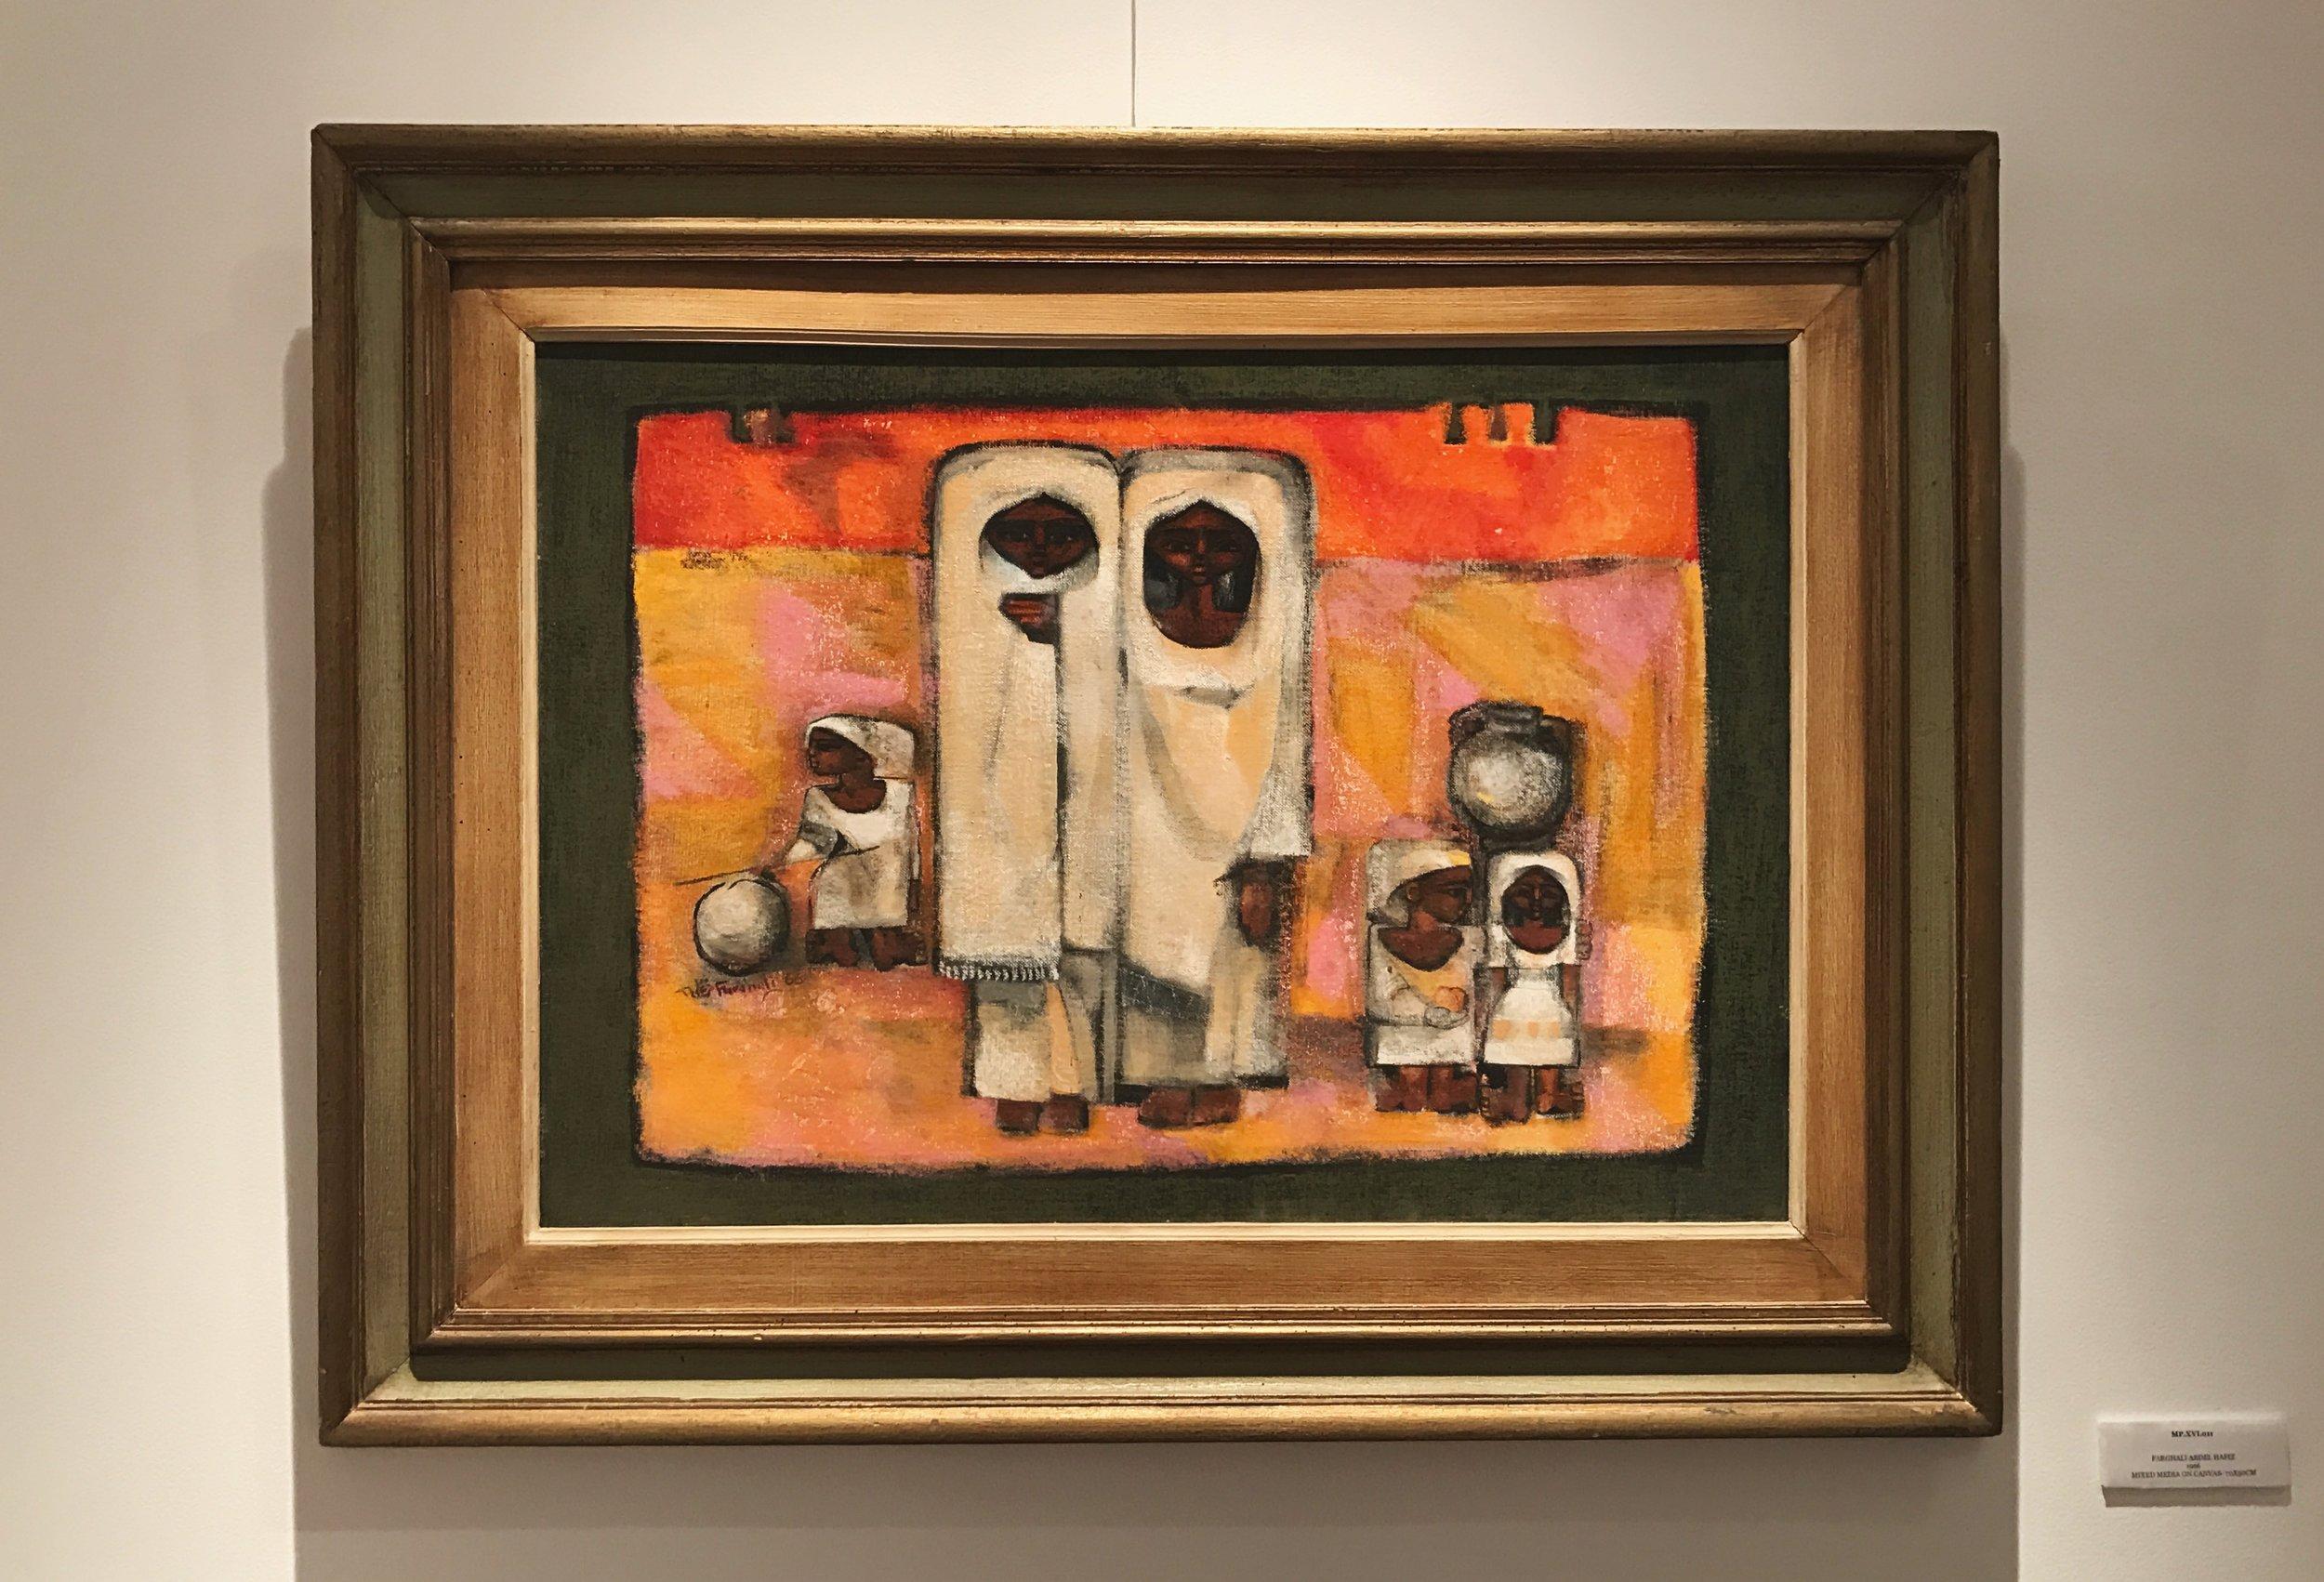 Farghali Abdel Hafiz   Mixed media on canvas  70x 50 cm  1966